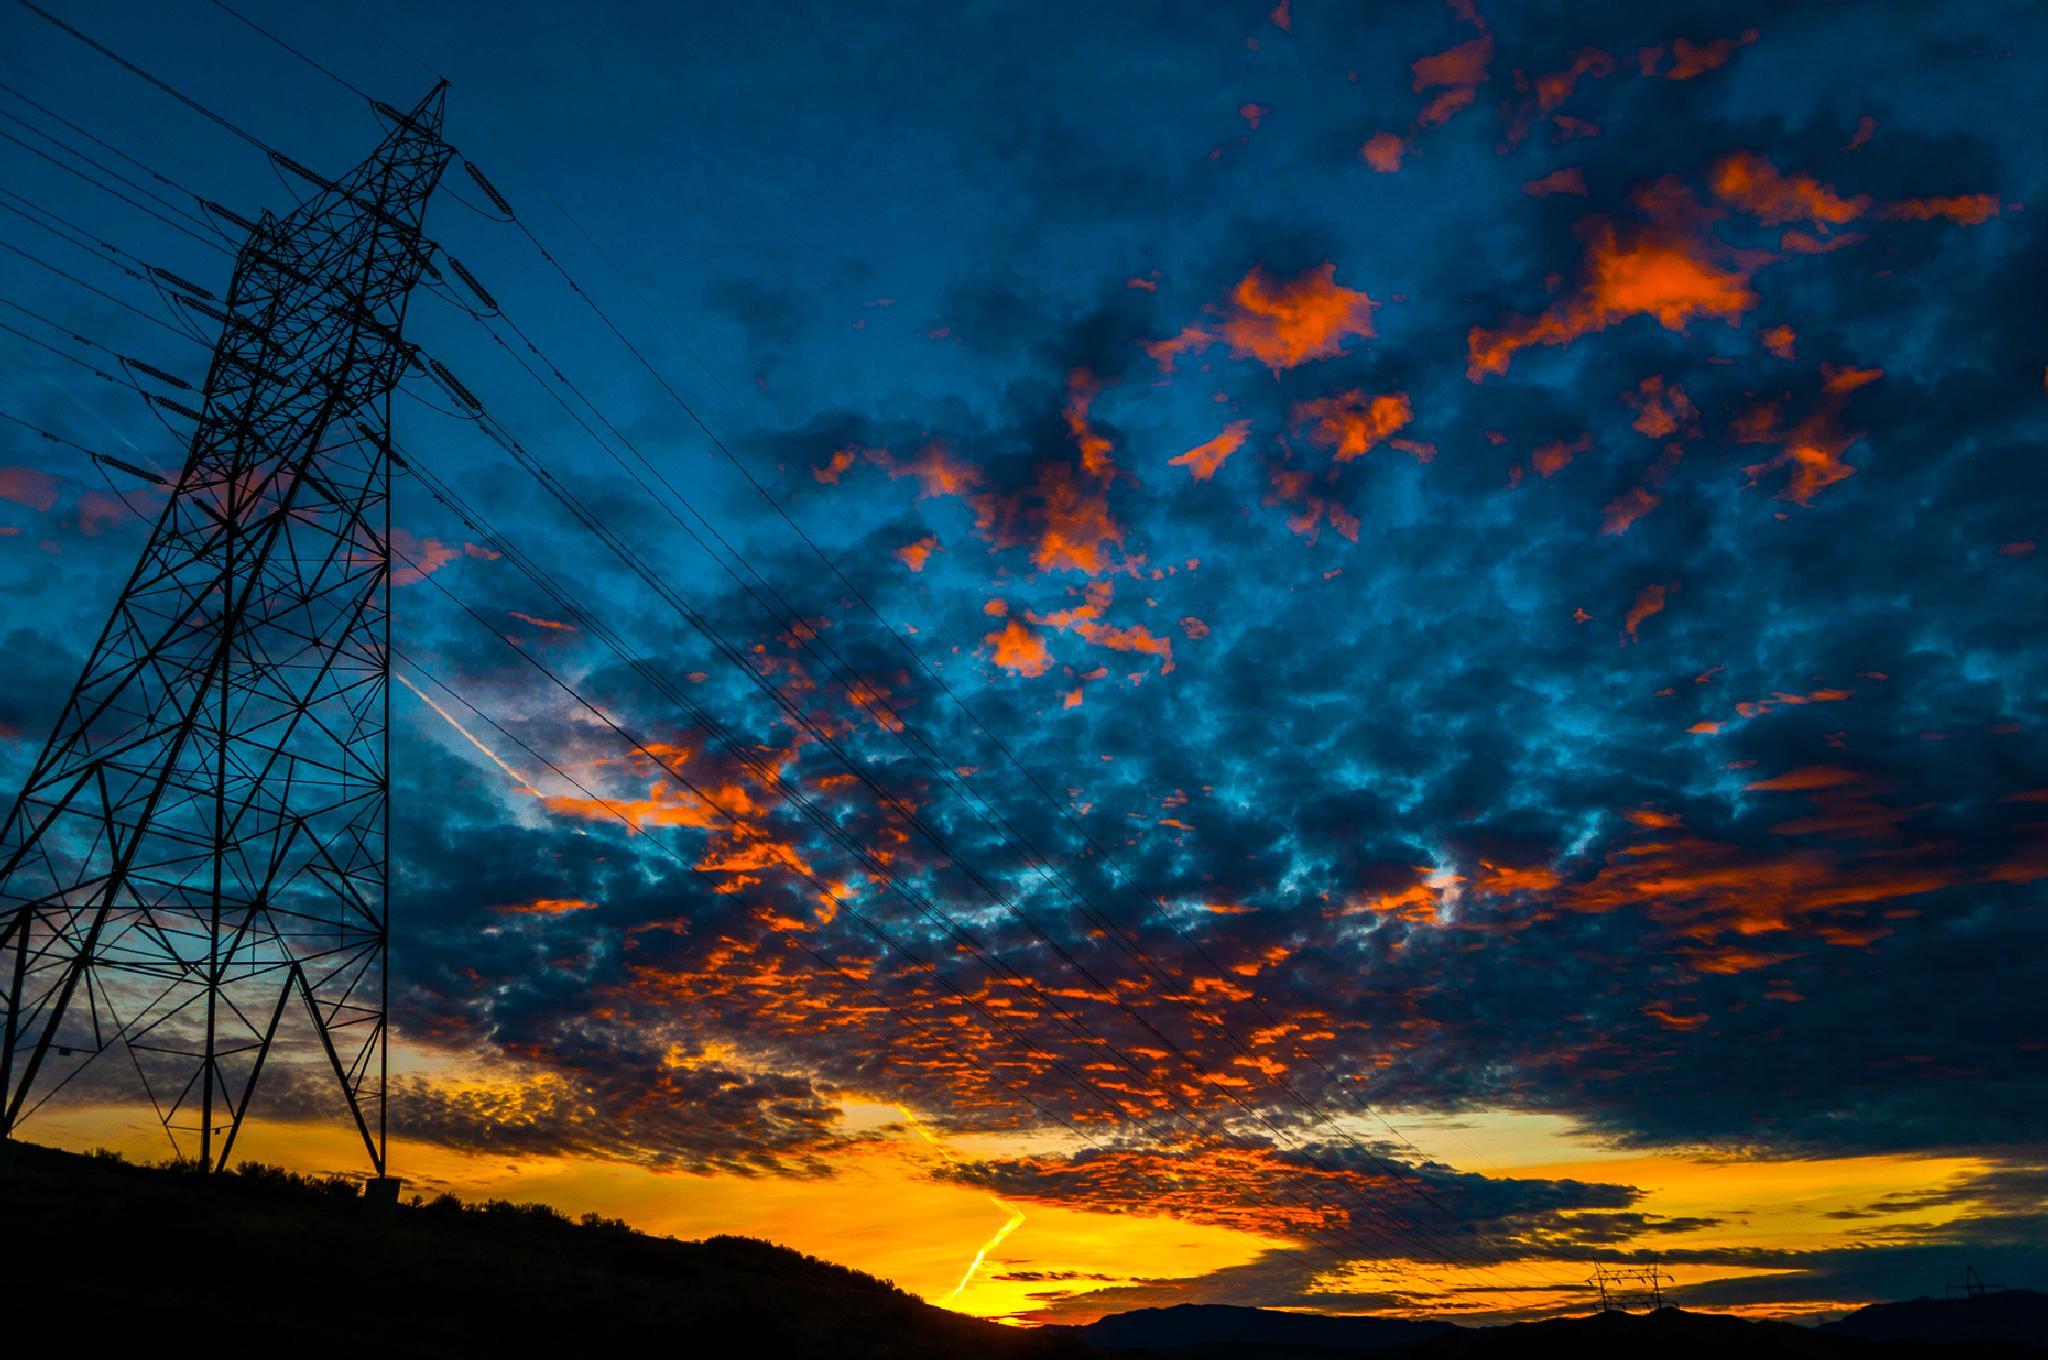 High Voltage Sunrise by JRGt12